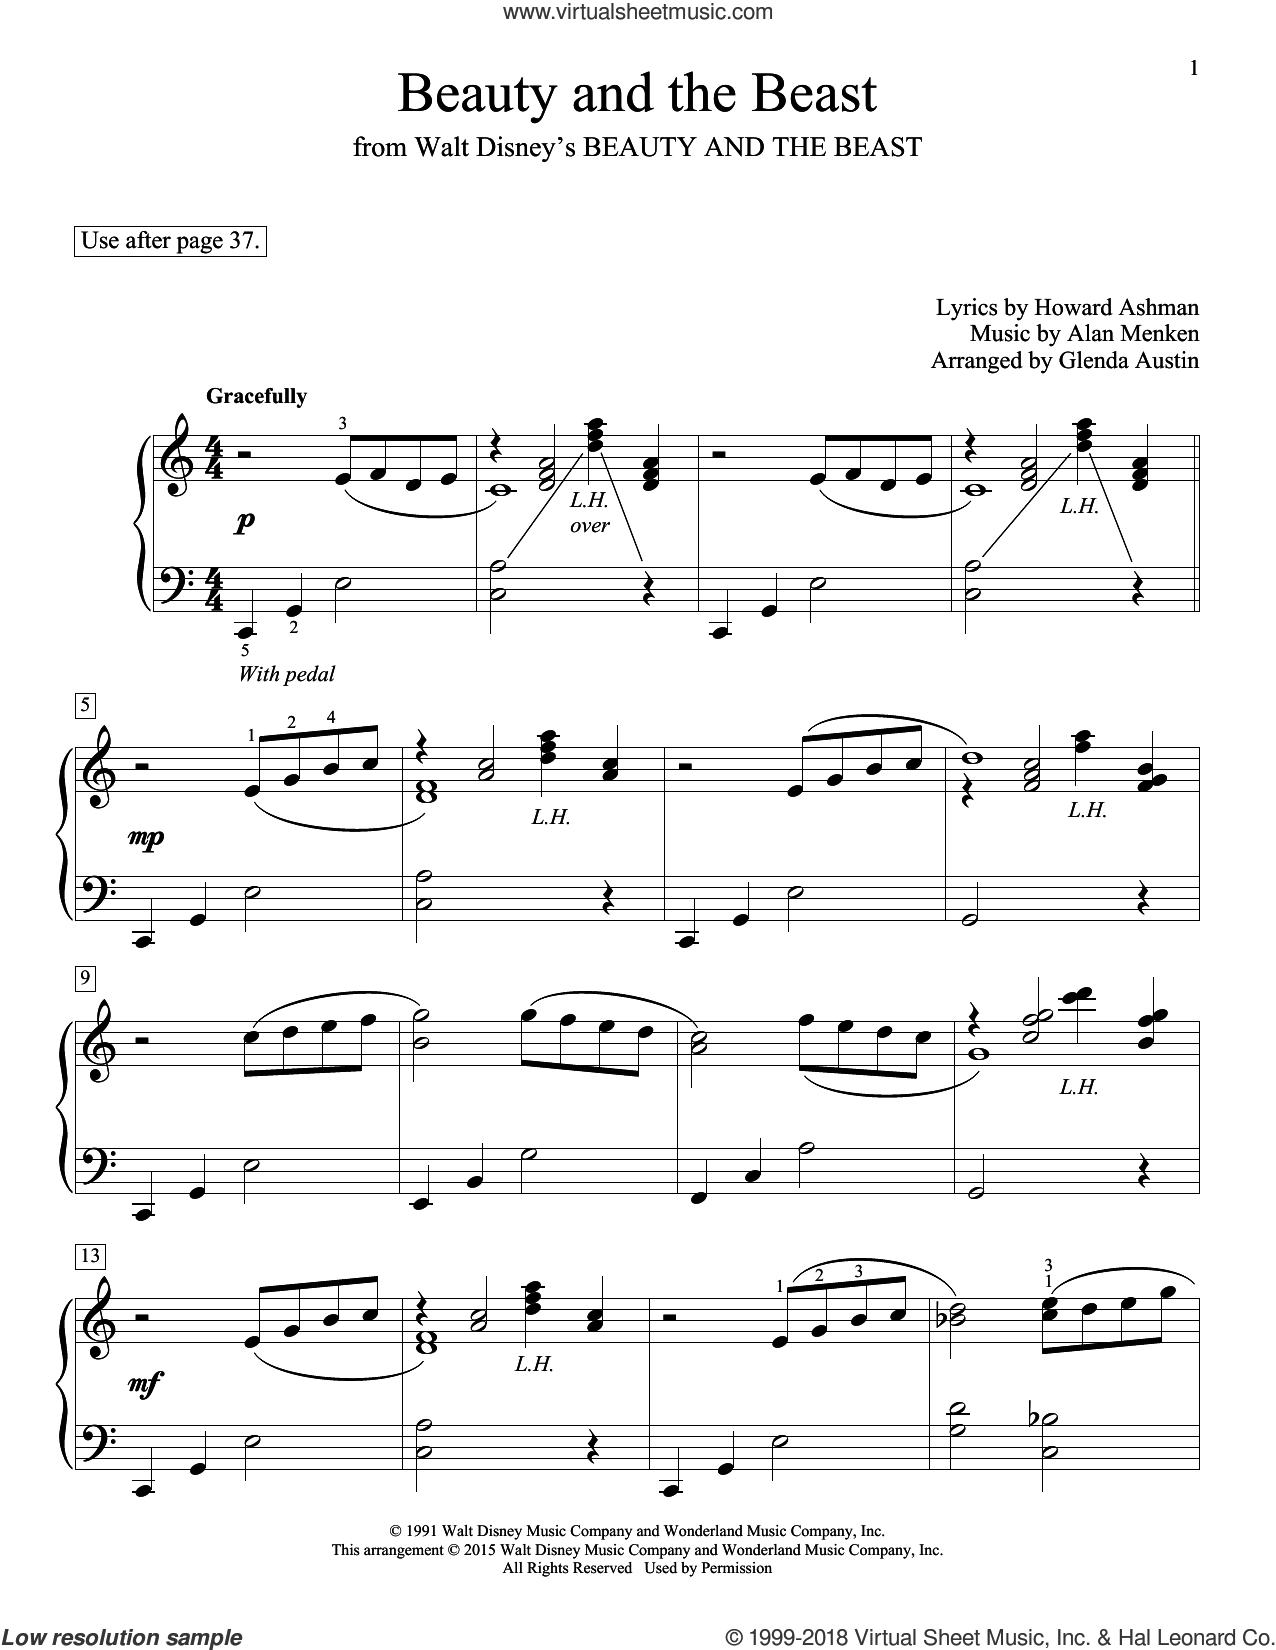 Beauty And The Beast sheet music for piano solo (elementary) by Alan Menken, Glenda Austin, John Thompson, Celine Dion & Peabo Bryson, Eric Baumgartner and Howard Ashman, beginner piano (elementary)